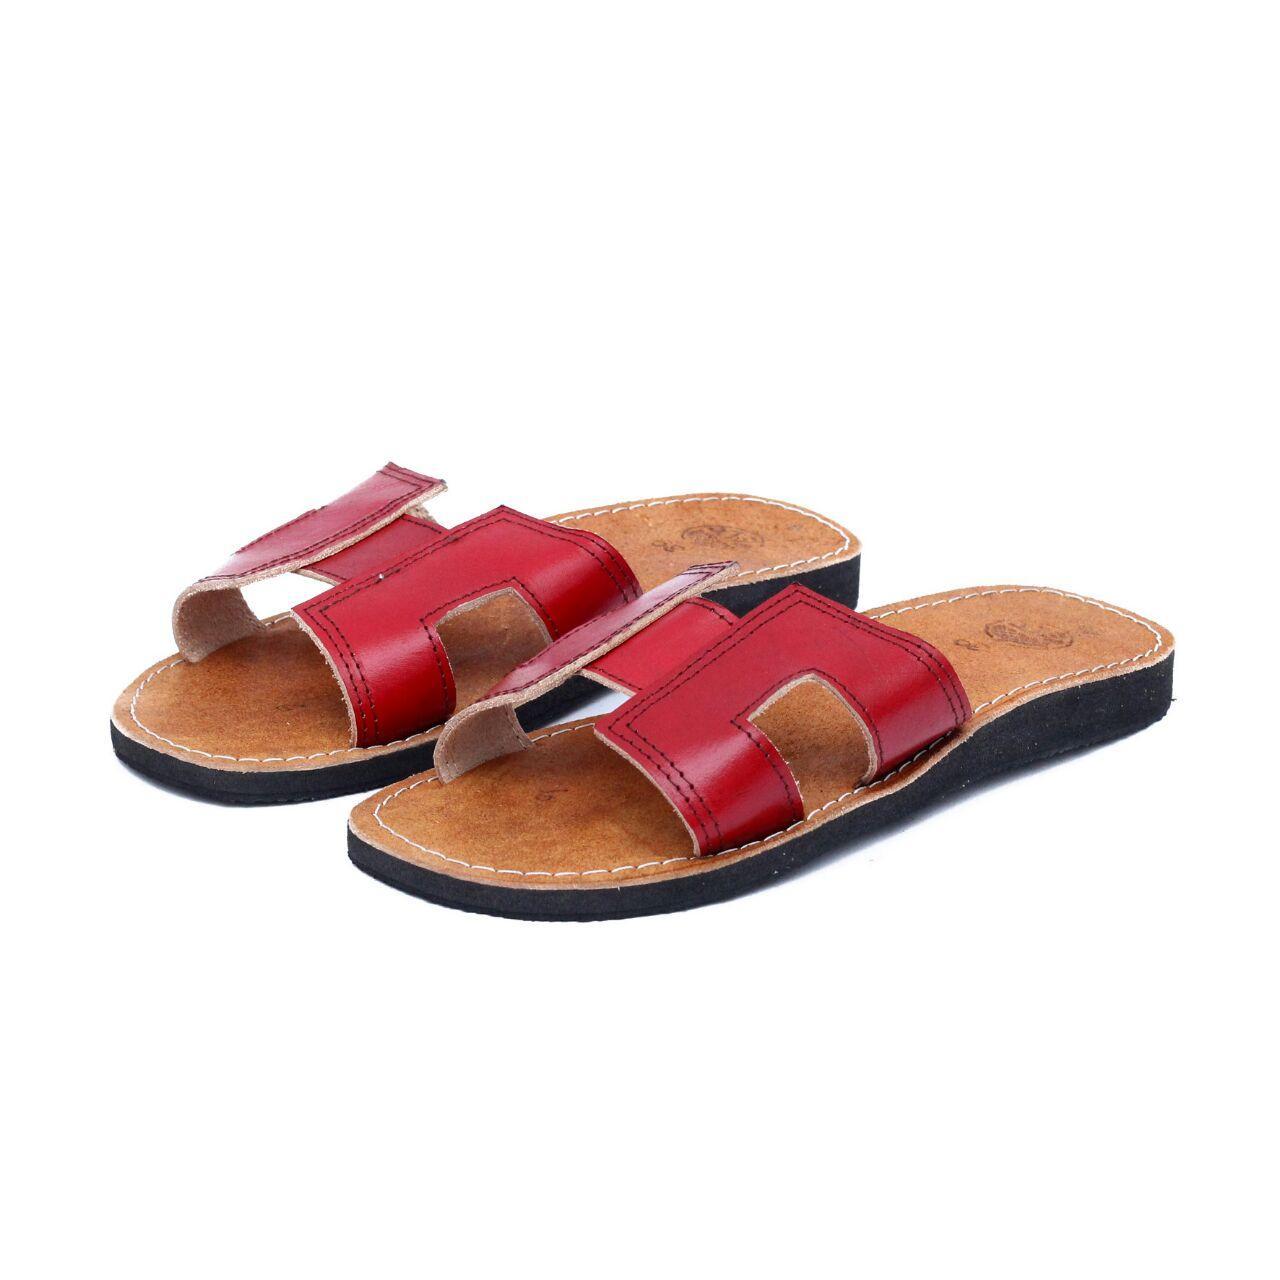 Sandal Kulit Asli Wanita Model H - Sandal Teplek Warna Maroon